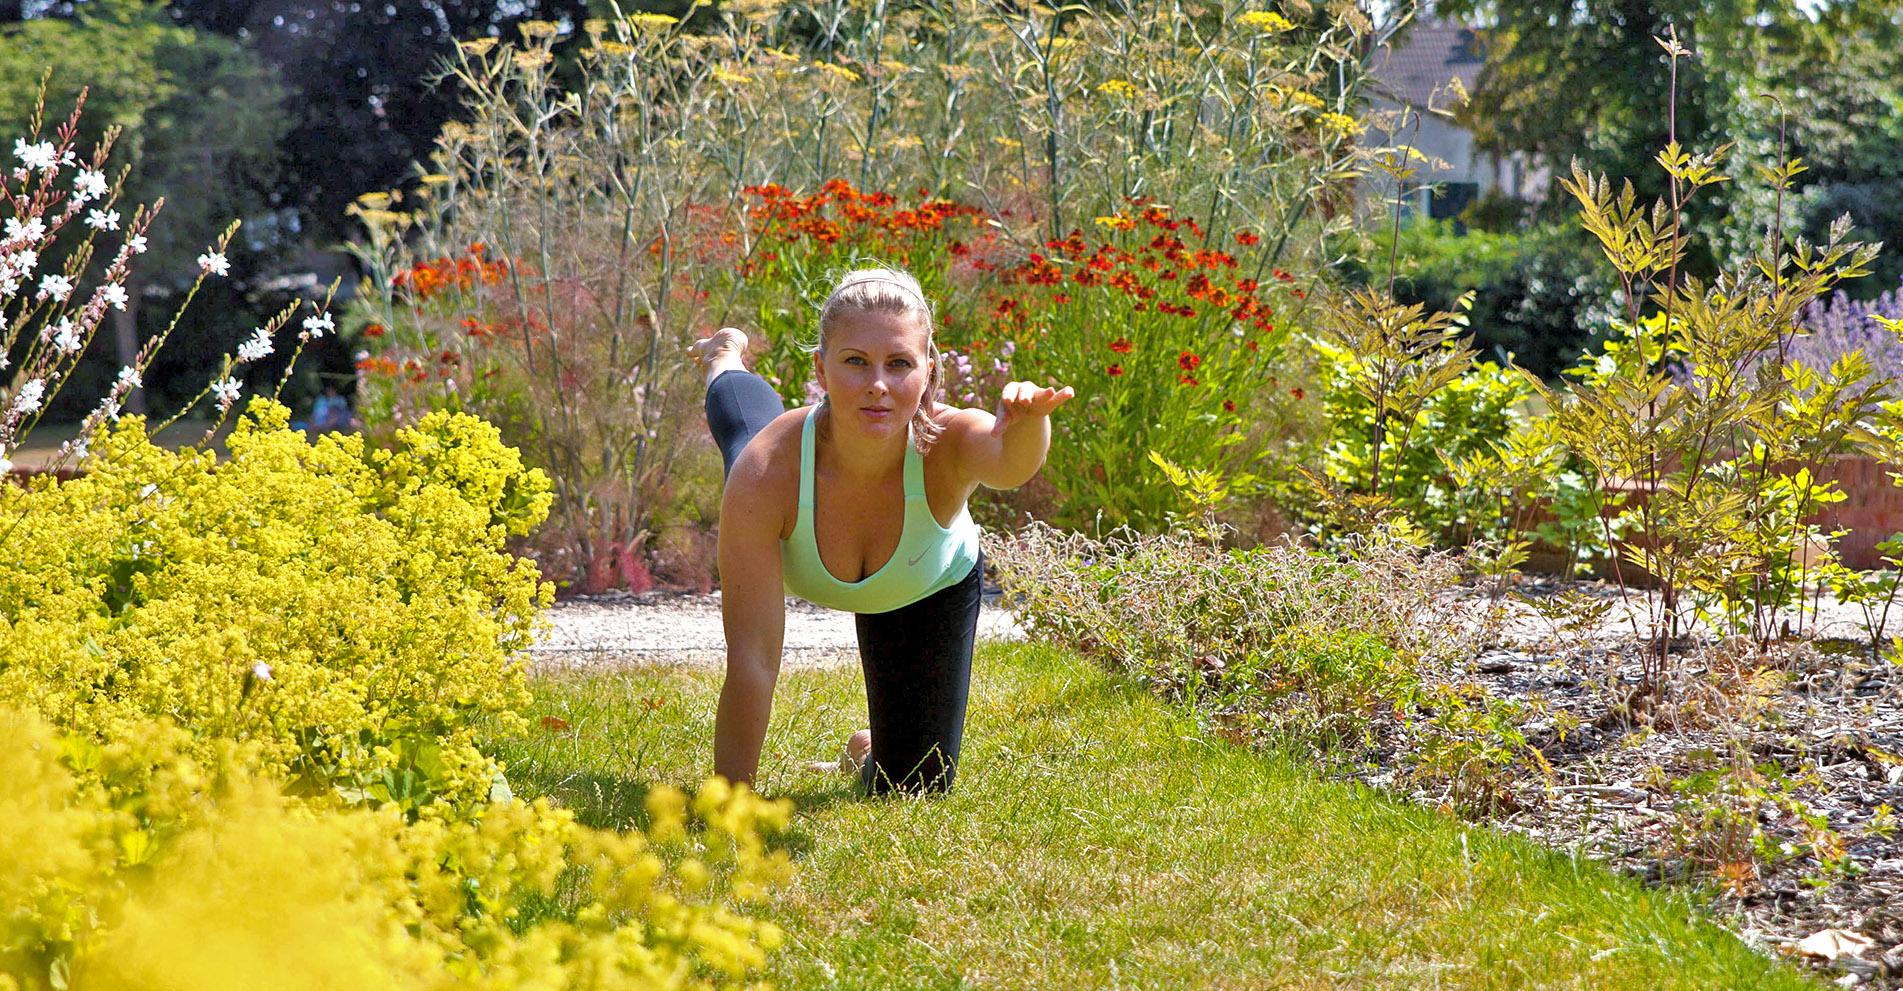 Lucia Yoga Pose 1 - Lucia Hoxha   Yoga   Lifestyle Coach   Online Yoga for Women